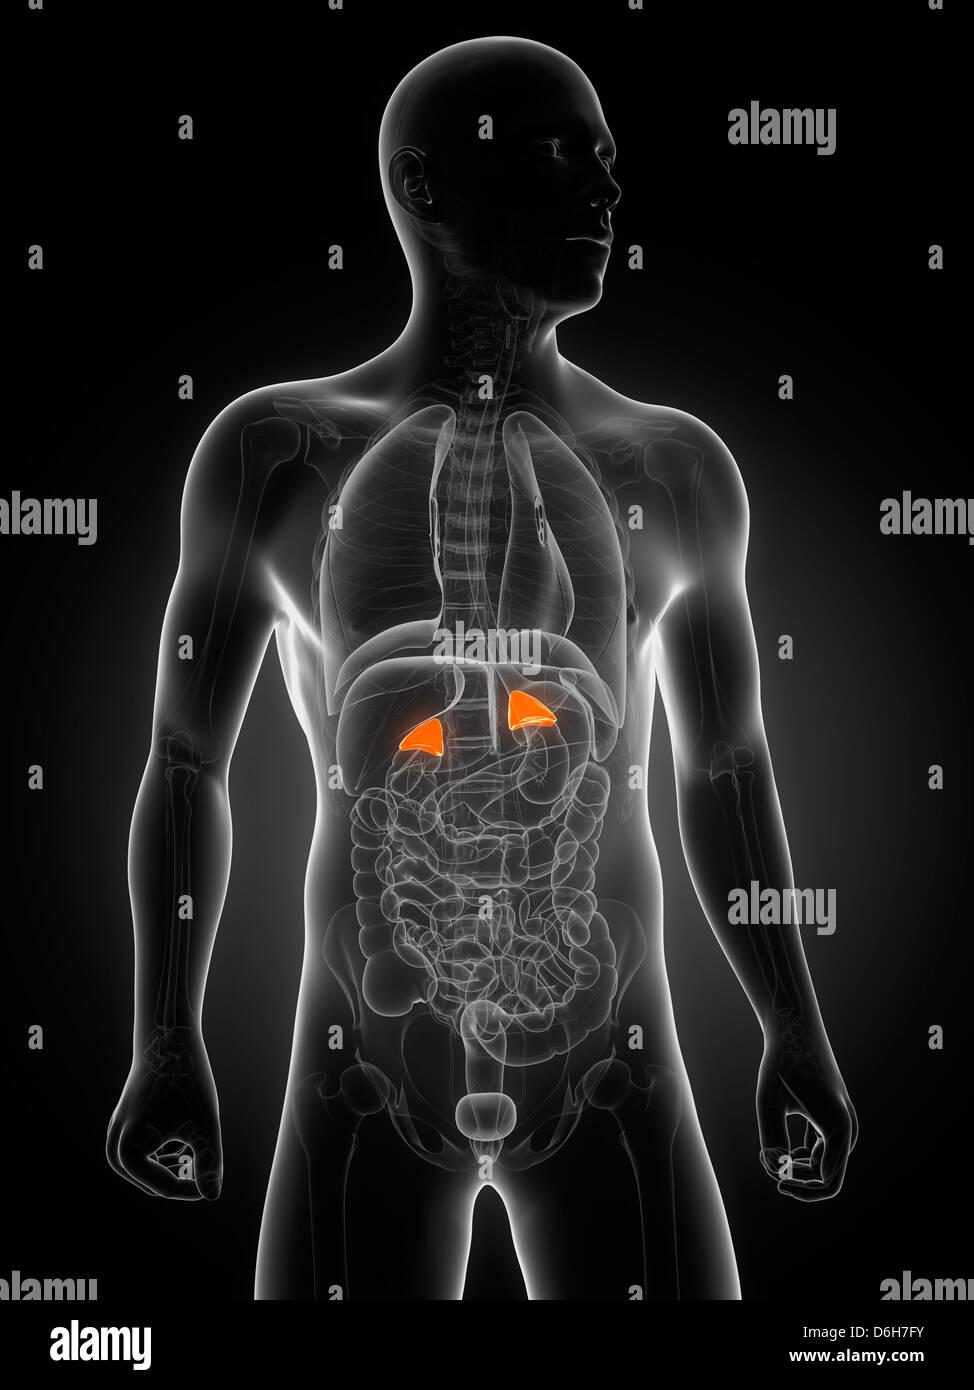 Healthy Adrenal Glands Artwork Stock Photo 55698159 Alamy